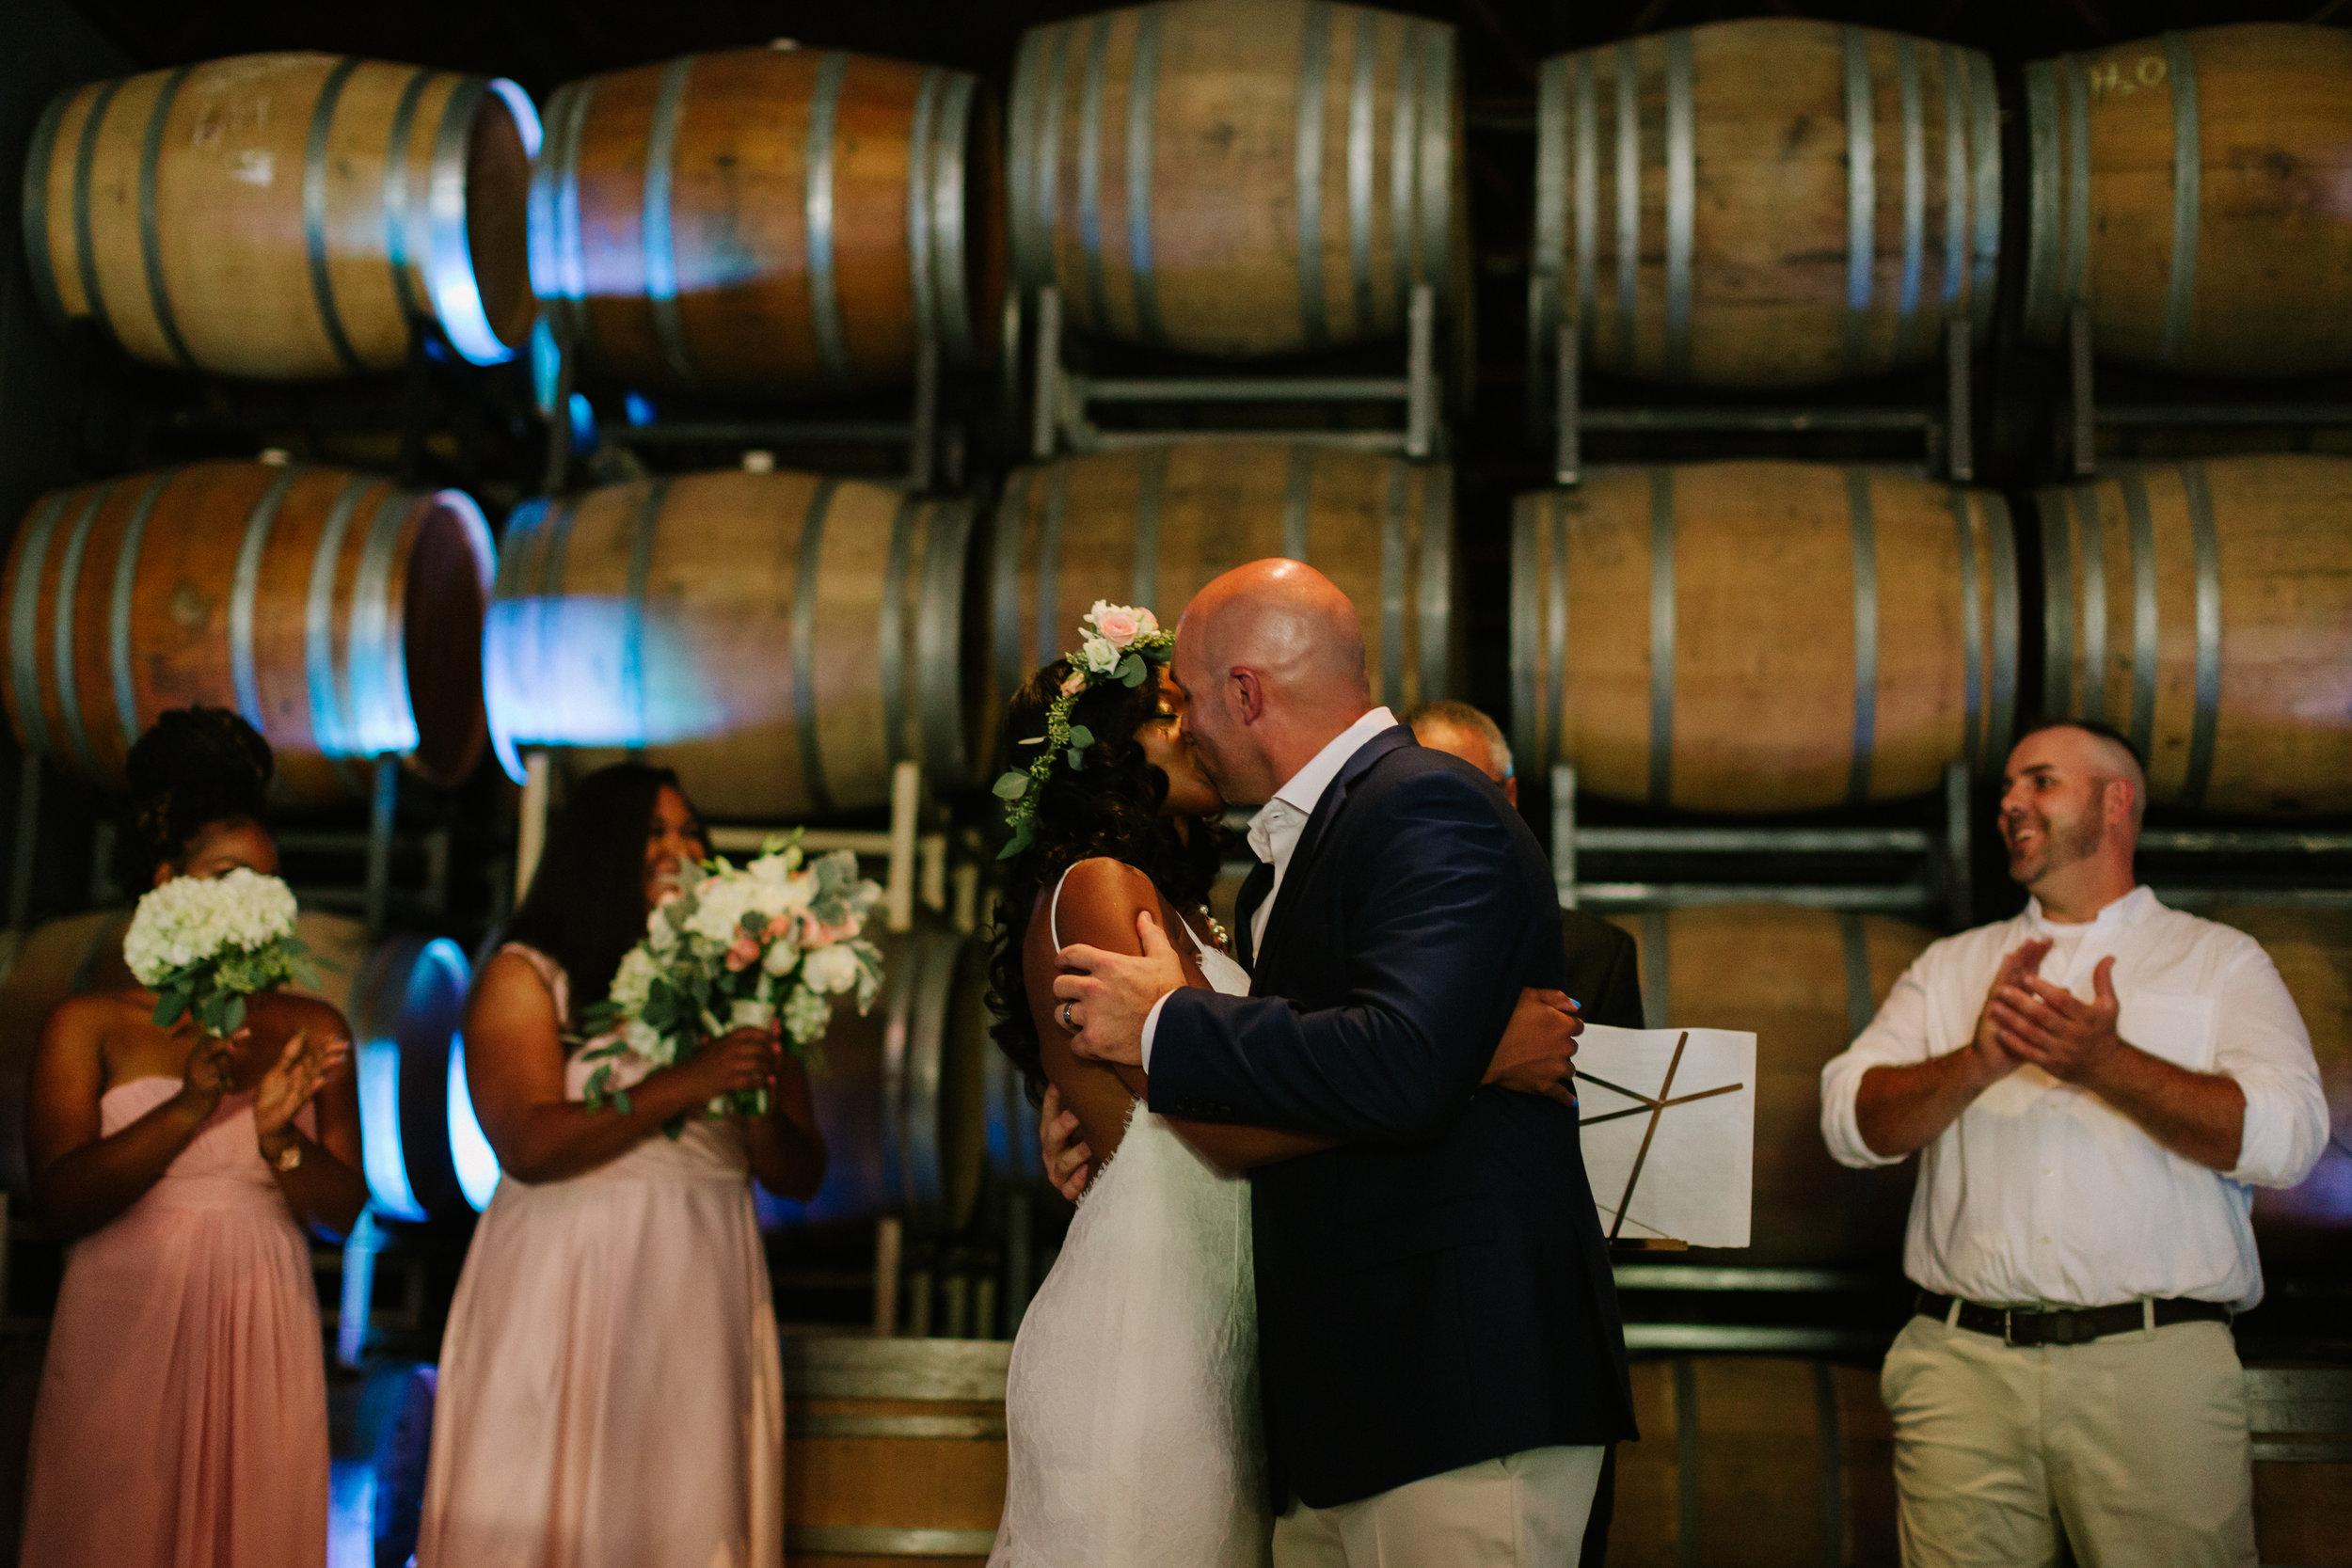 2017.09.16 Ashley and Chuck O'Day Quantam Leap Winery Wedding (181 of 462).jpg